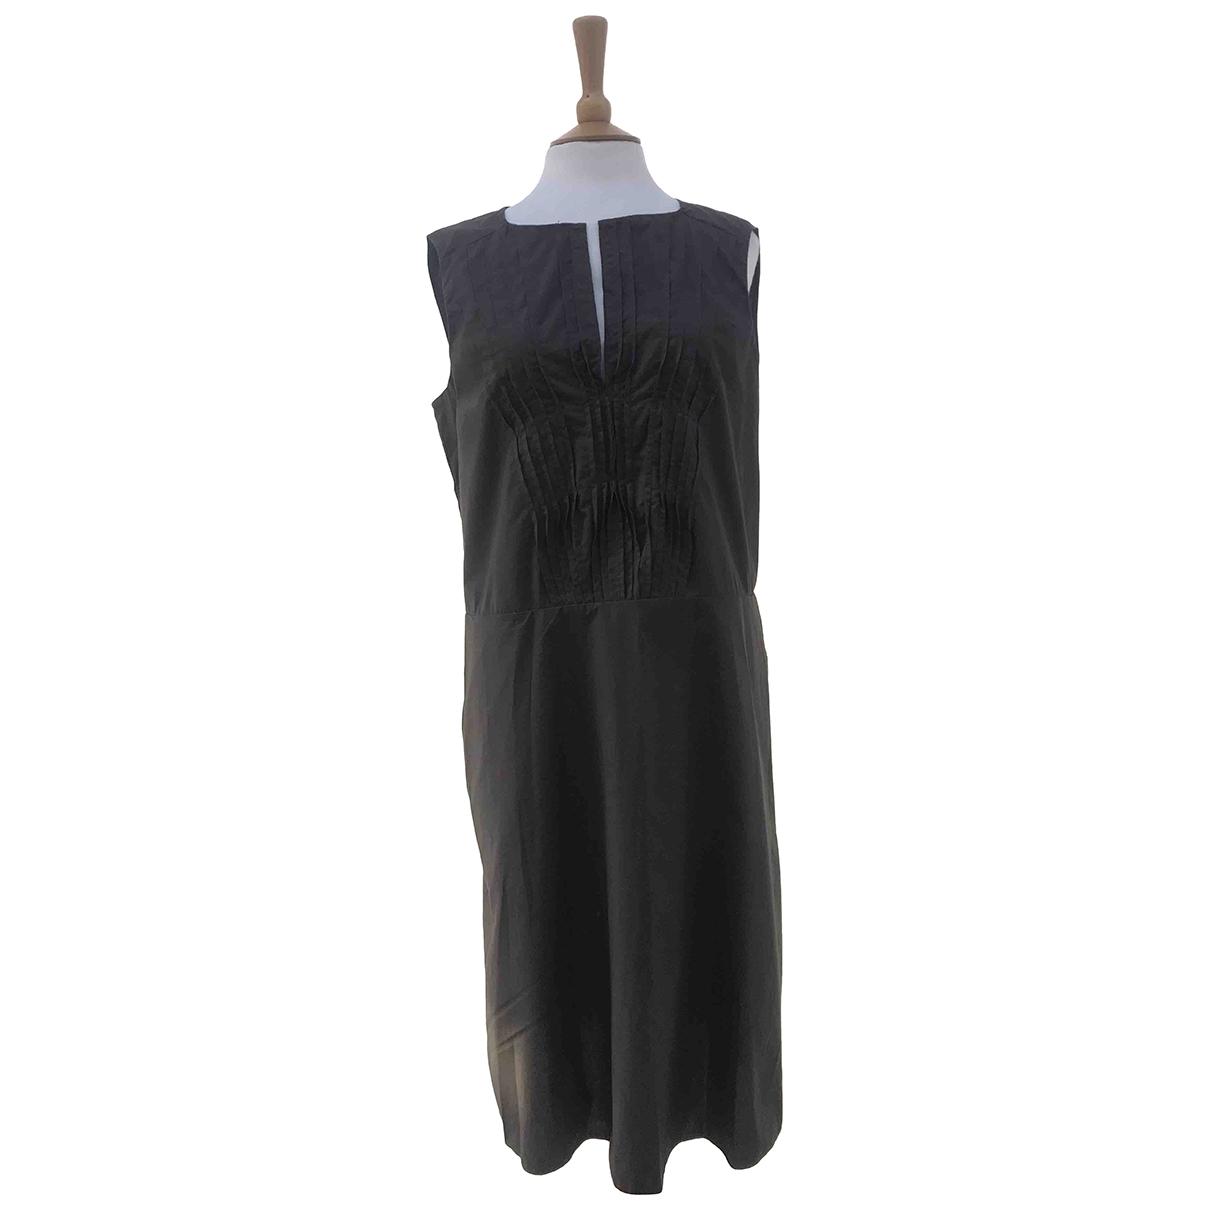 Marni \N Brown Cotton dress for Women 42 IT